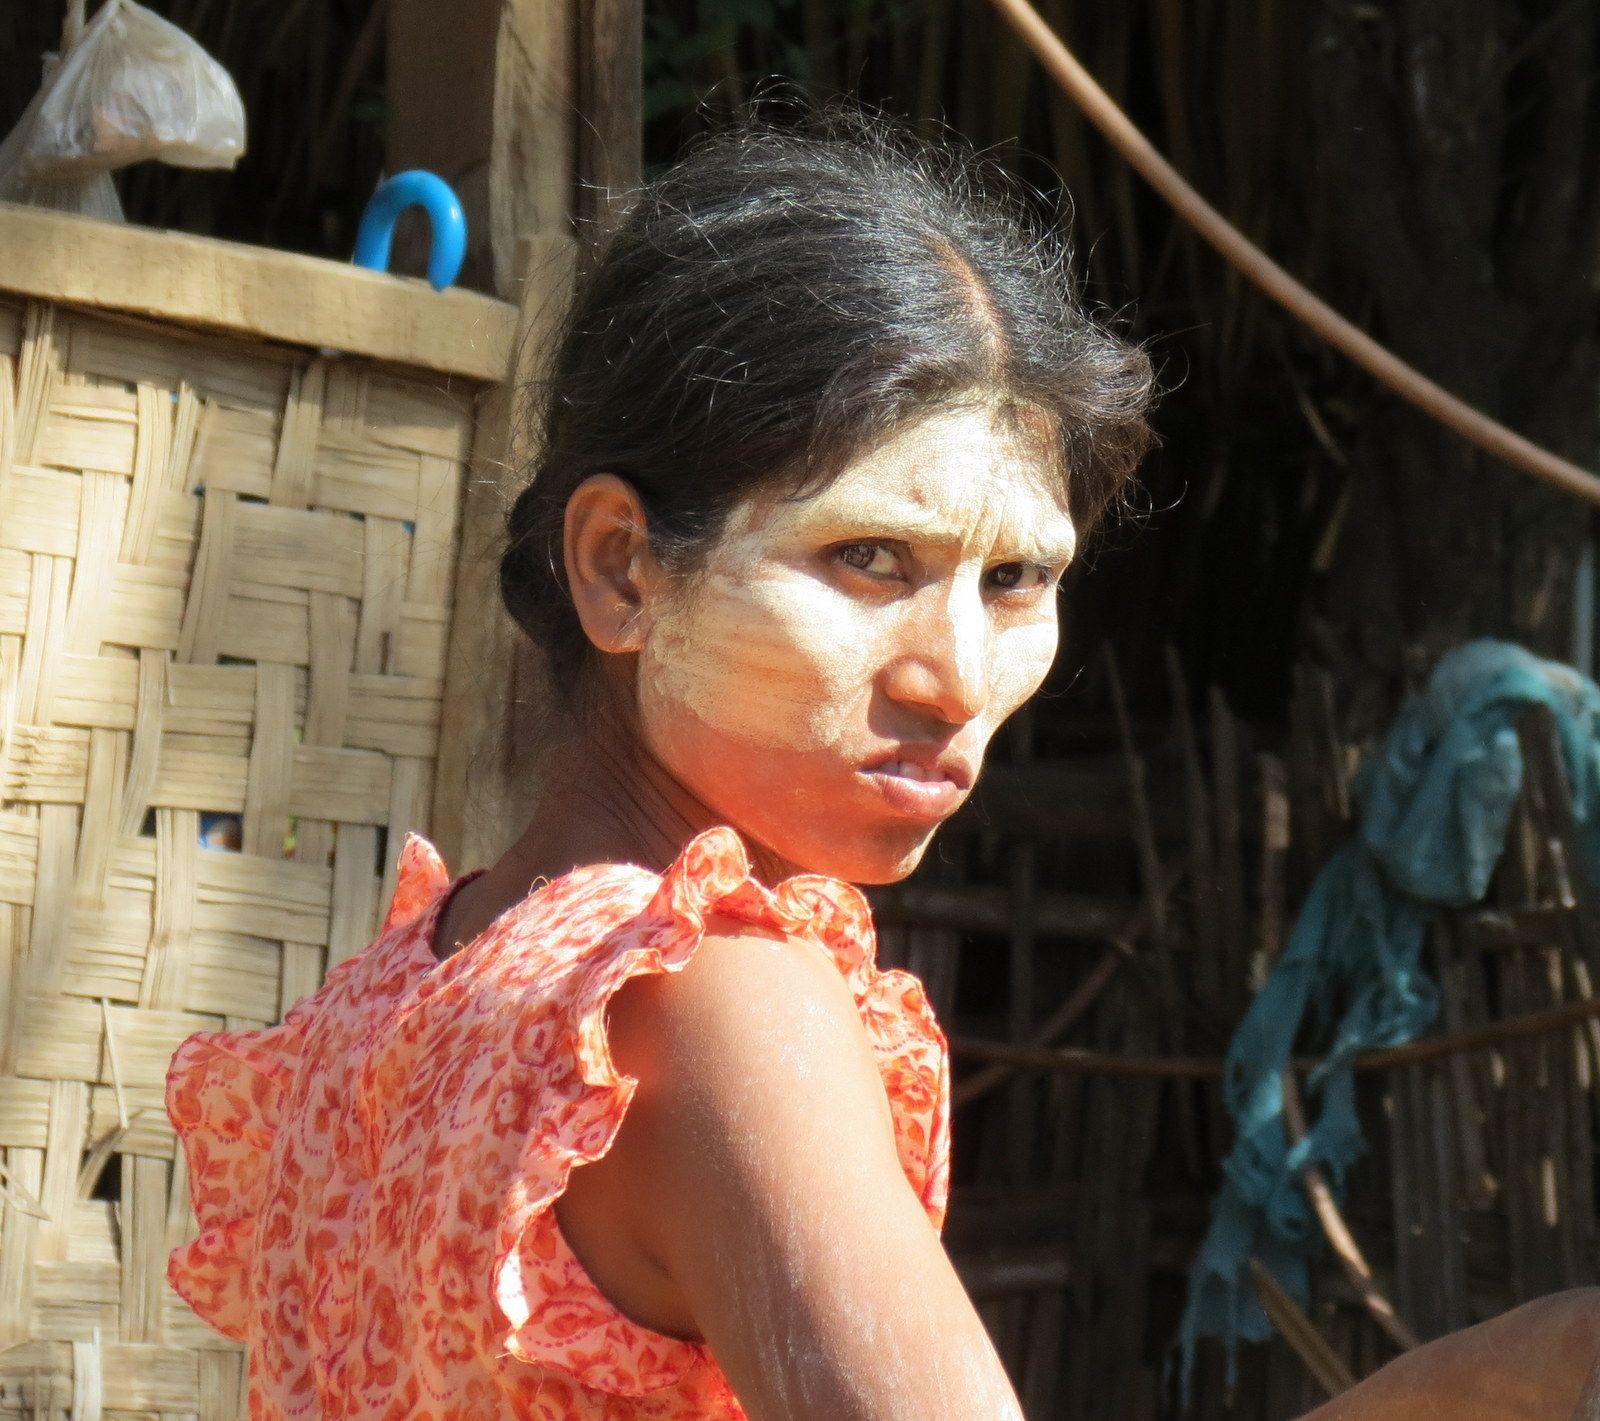 Burmese woman looking back #burma #myanmar #travel #travelphotography